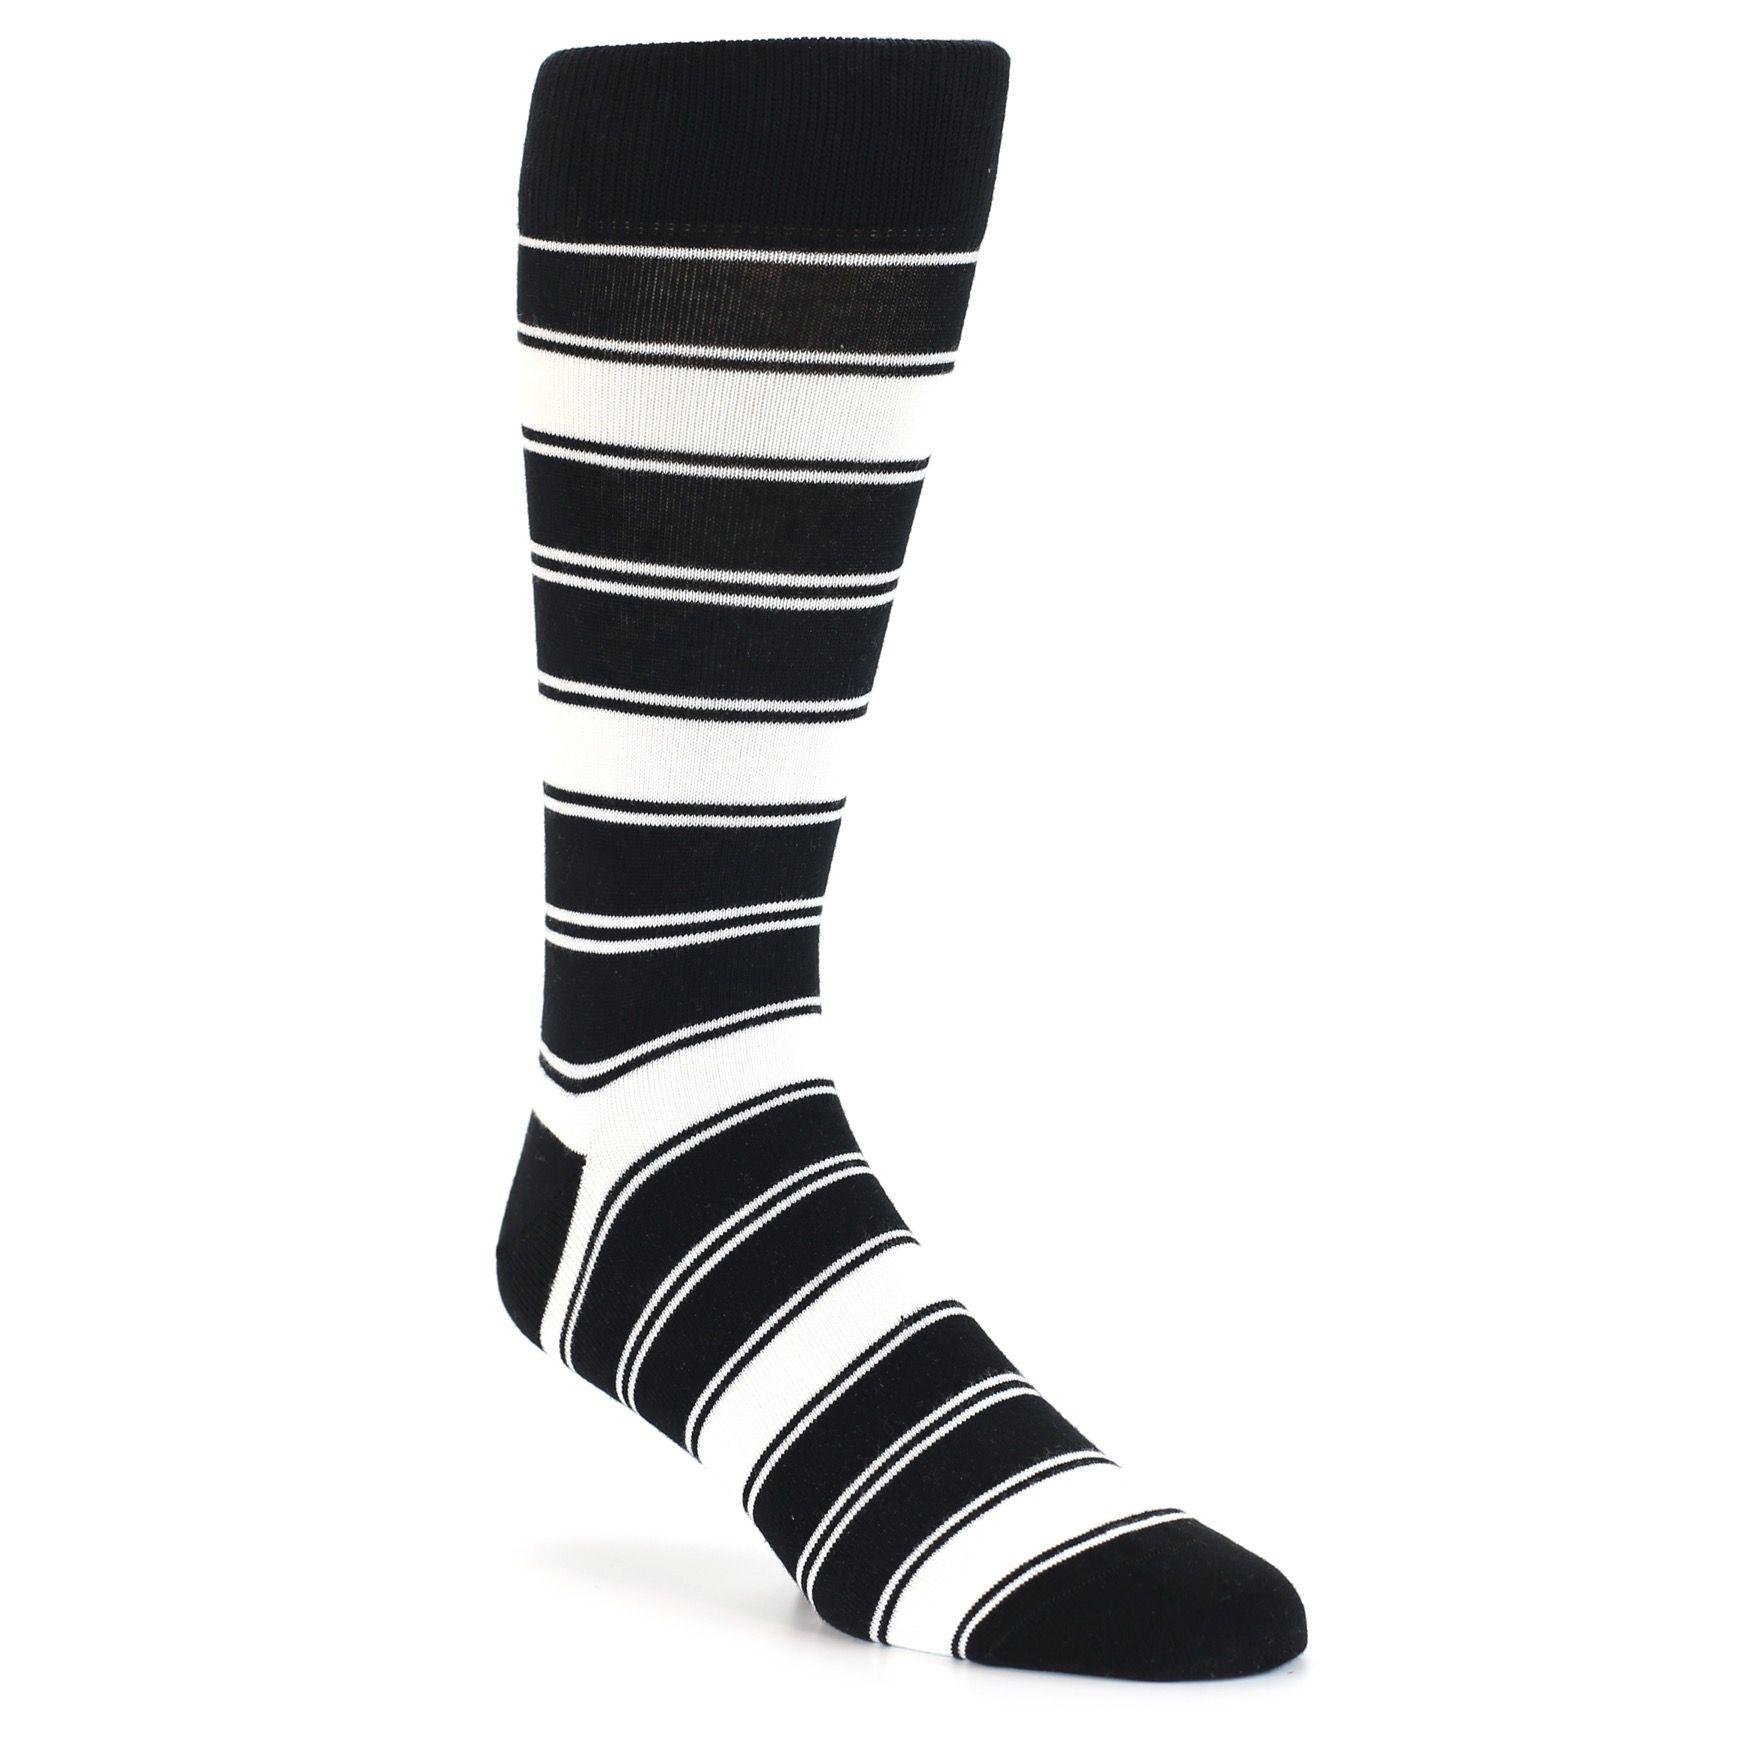 Black White Stripe Men S Dress Socks Boldsocks Mens Dress Socks Funky Socks For Men Black White Stripes [ 1750 x 1750 Pixel ]